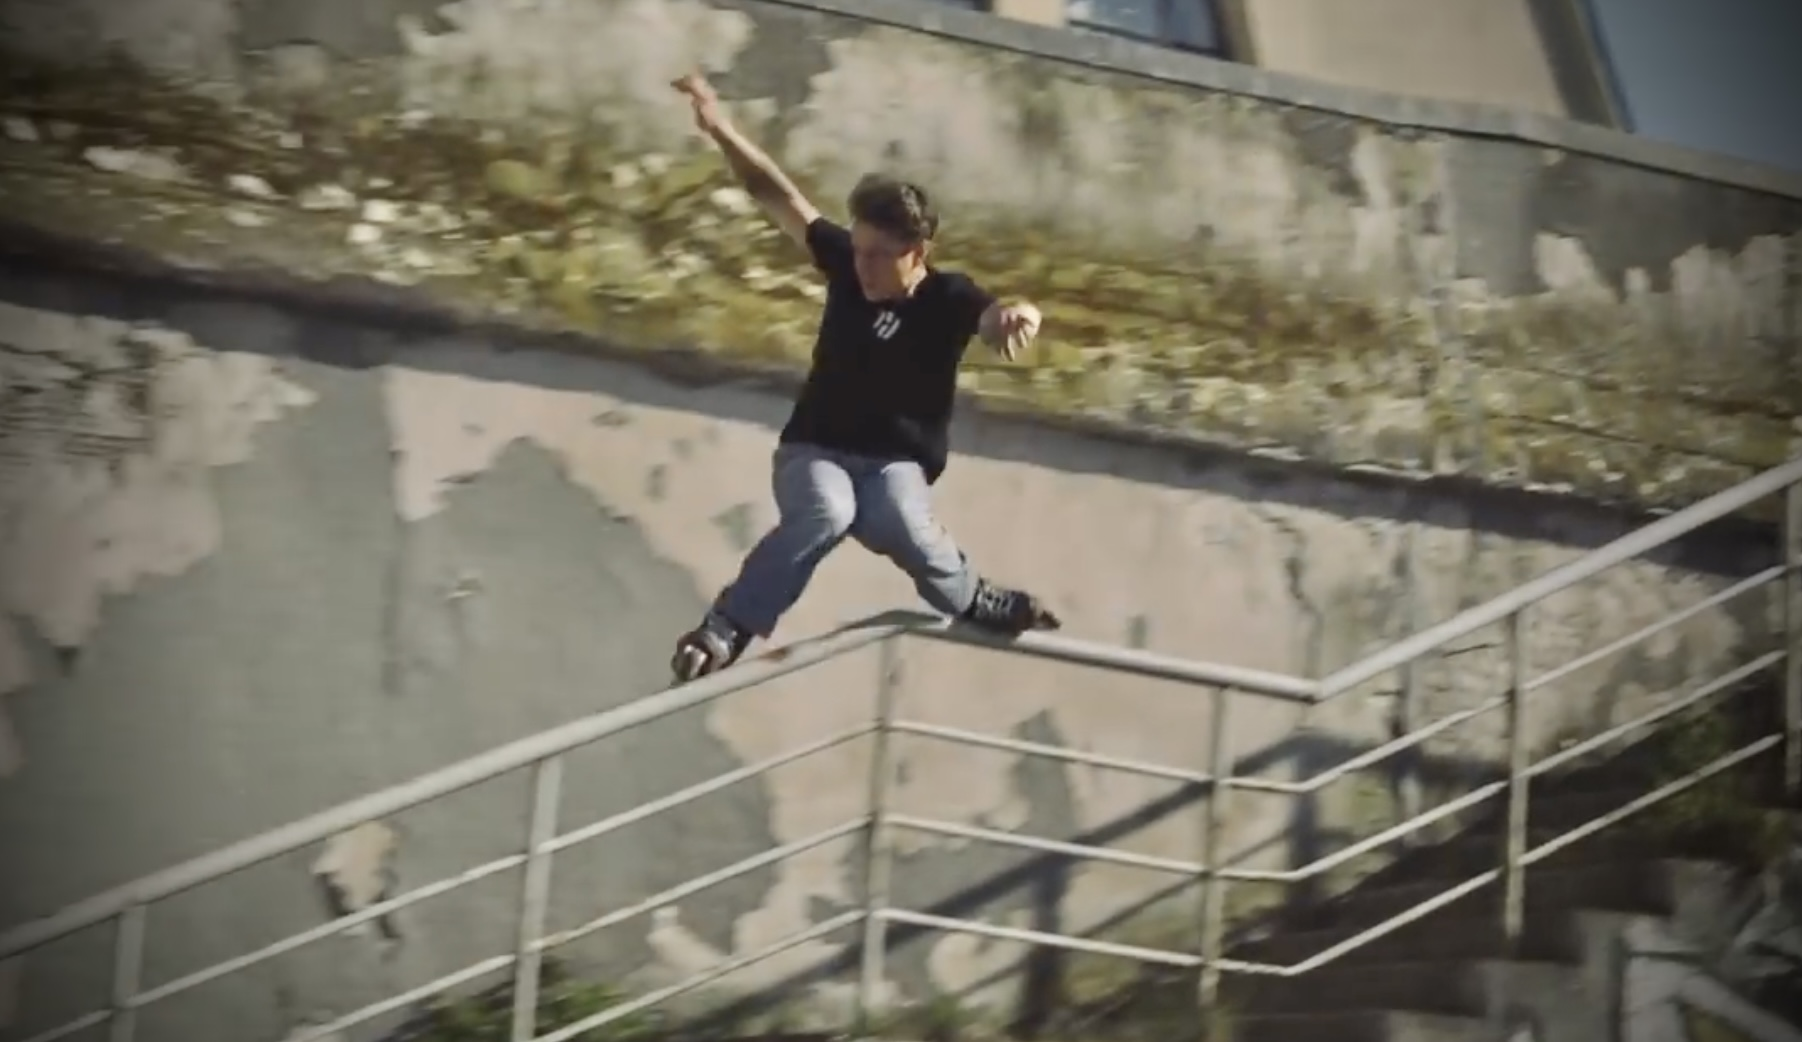 """STORM"" Nils Jansons Pro Skate"